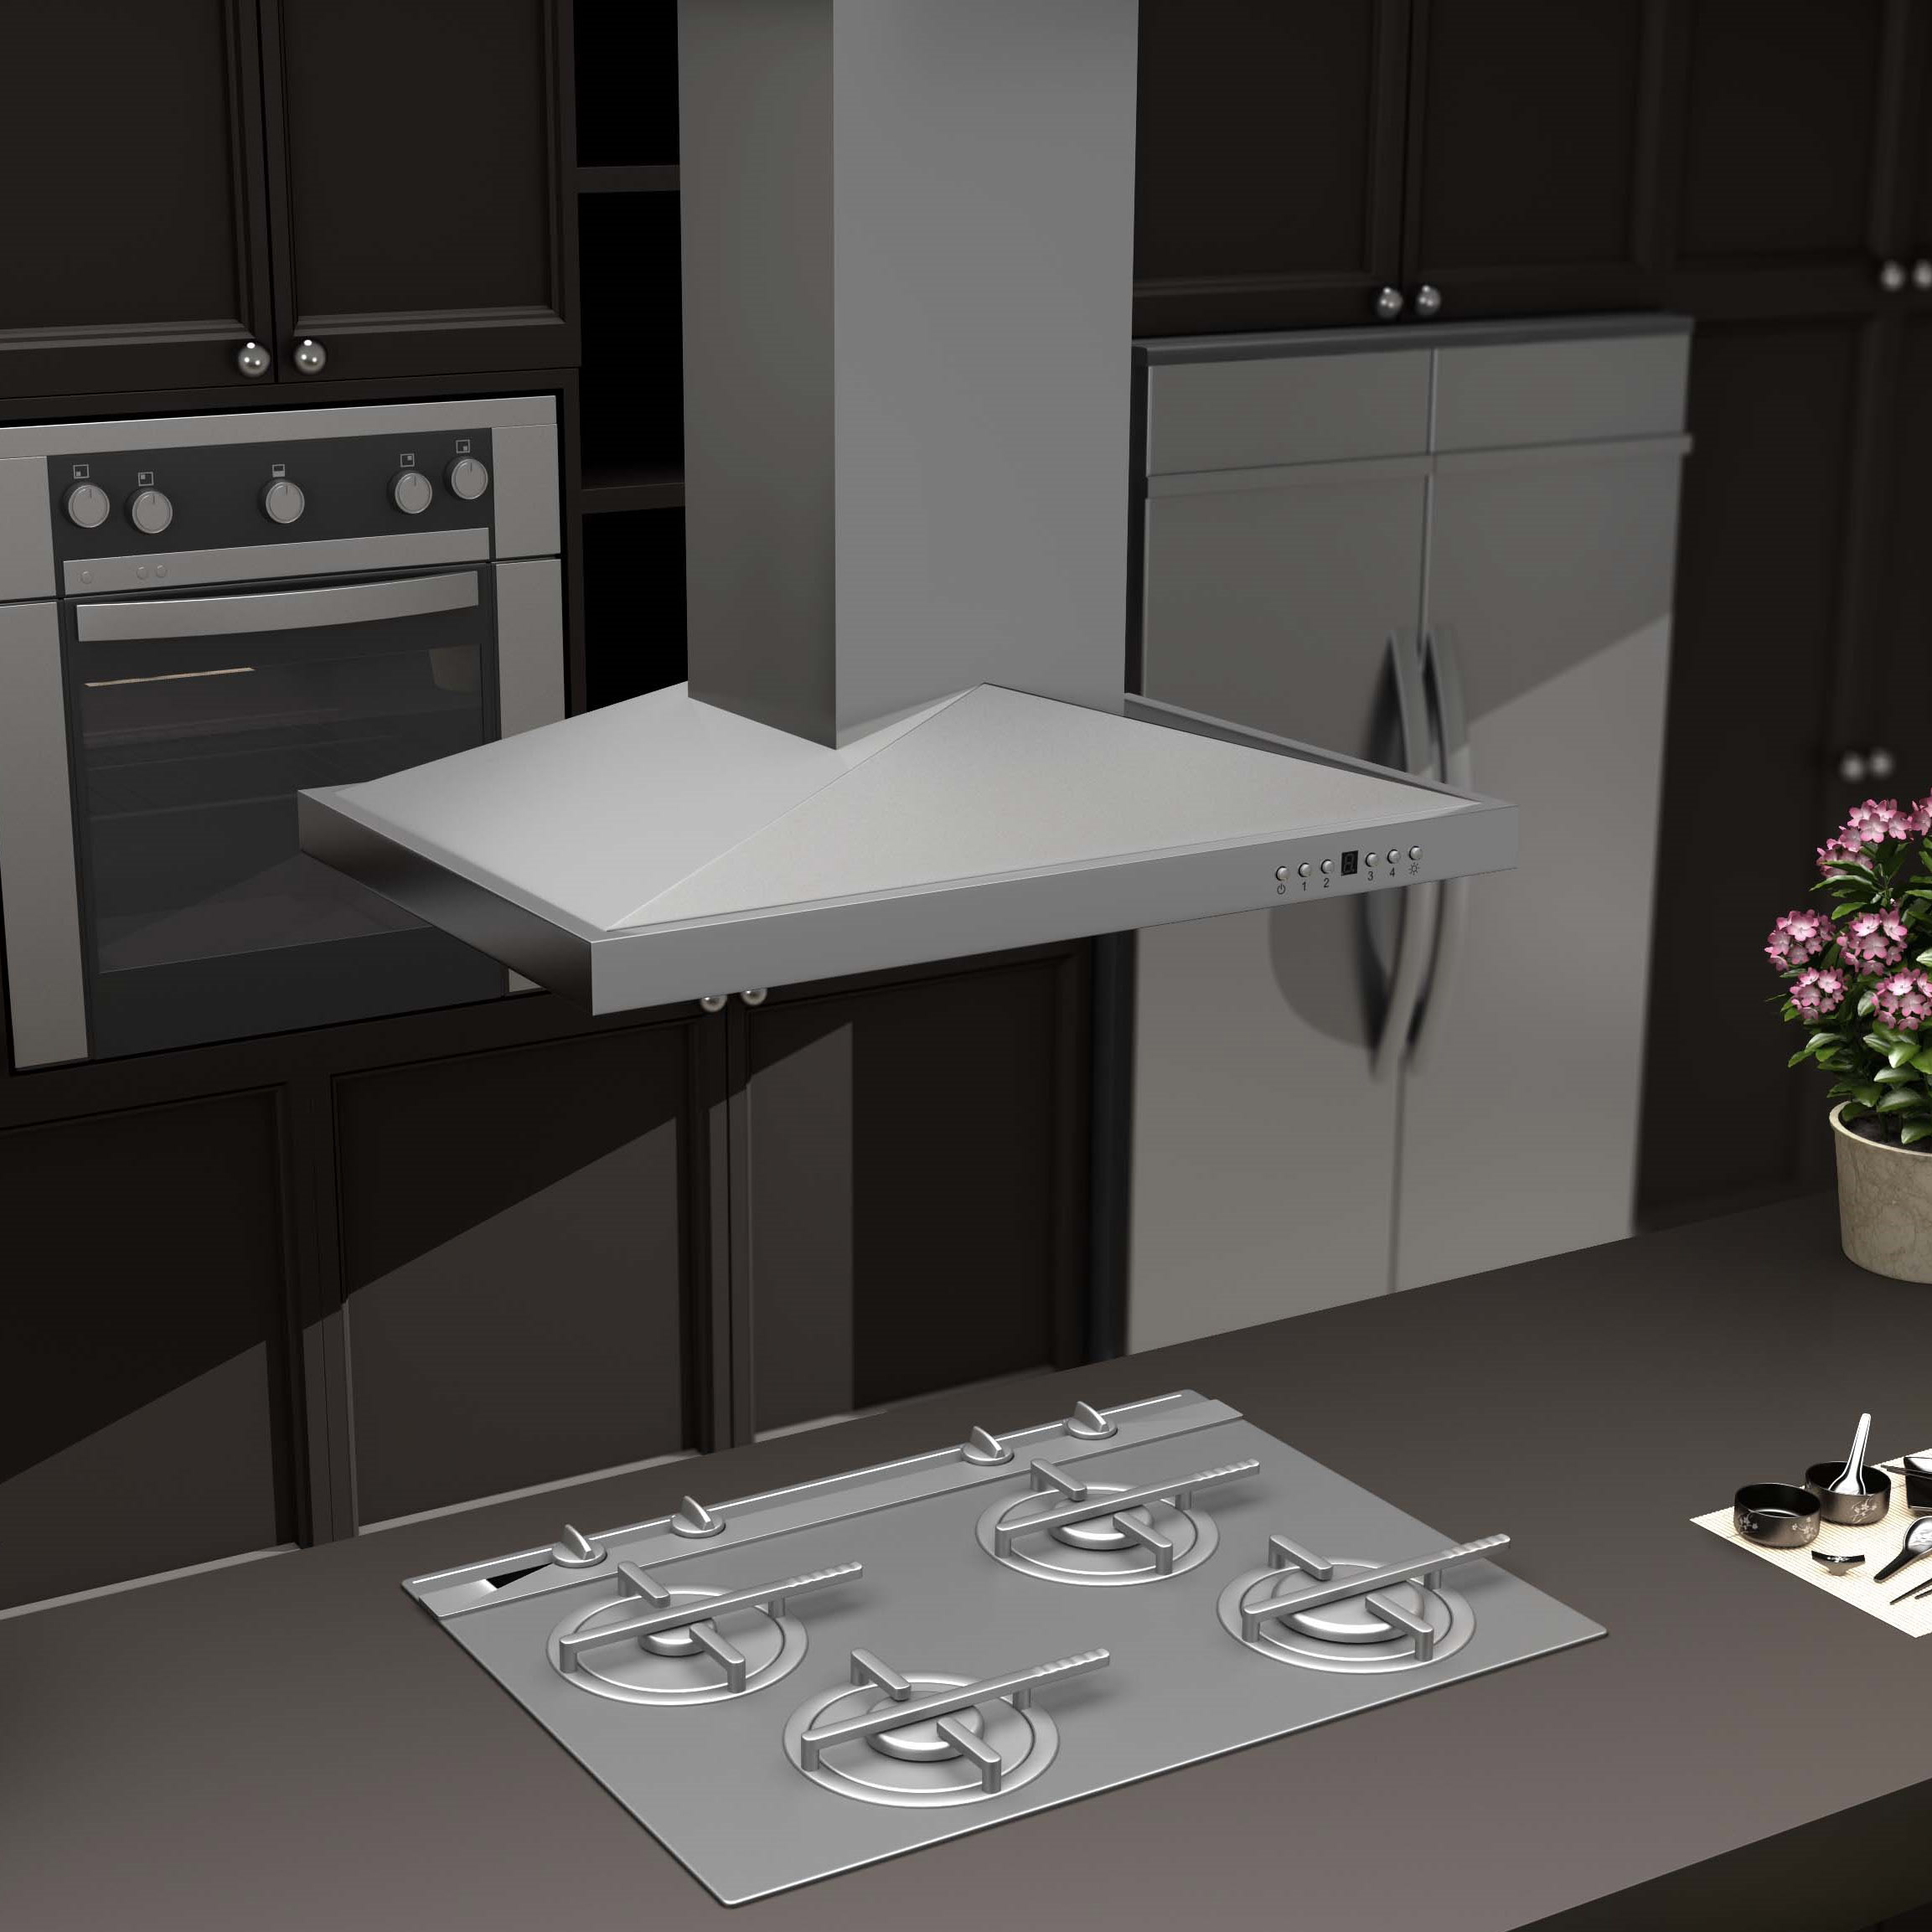 zline-stainless-steel-island-range-hood-GL1i-kitchen-detail.jpg